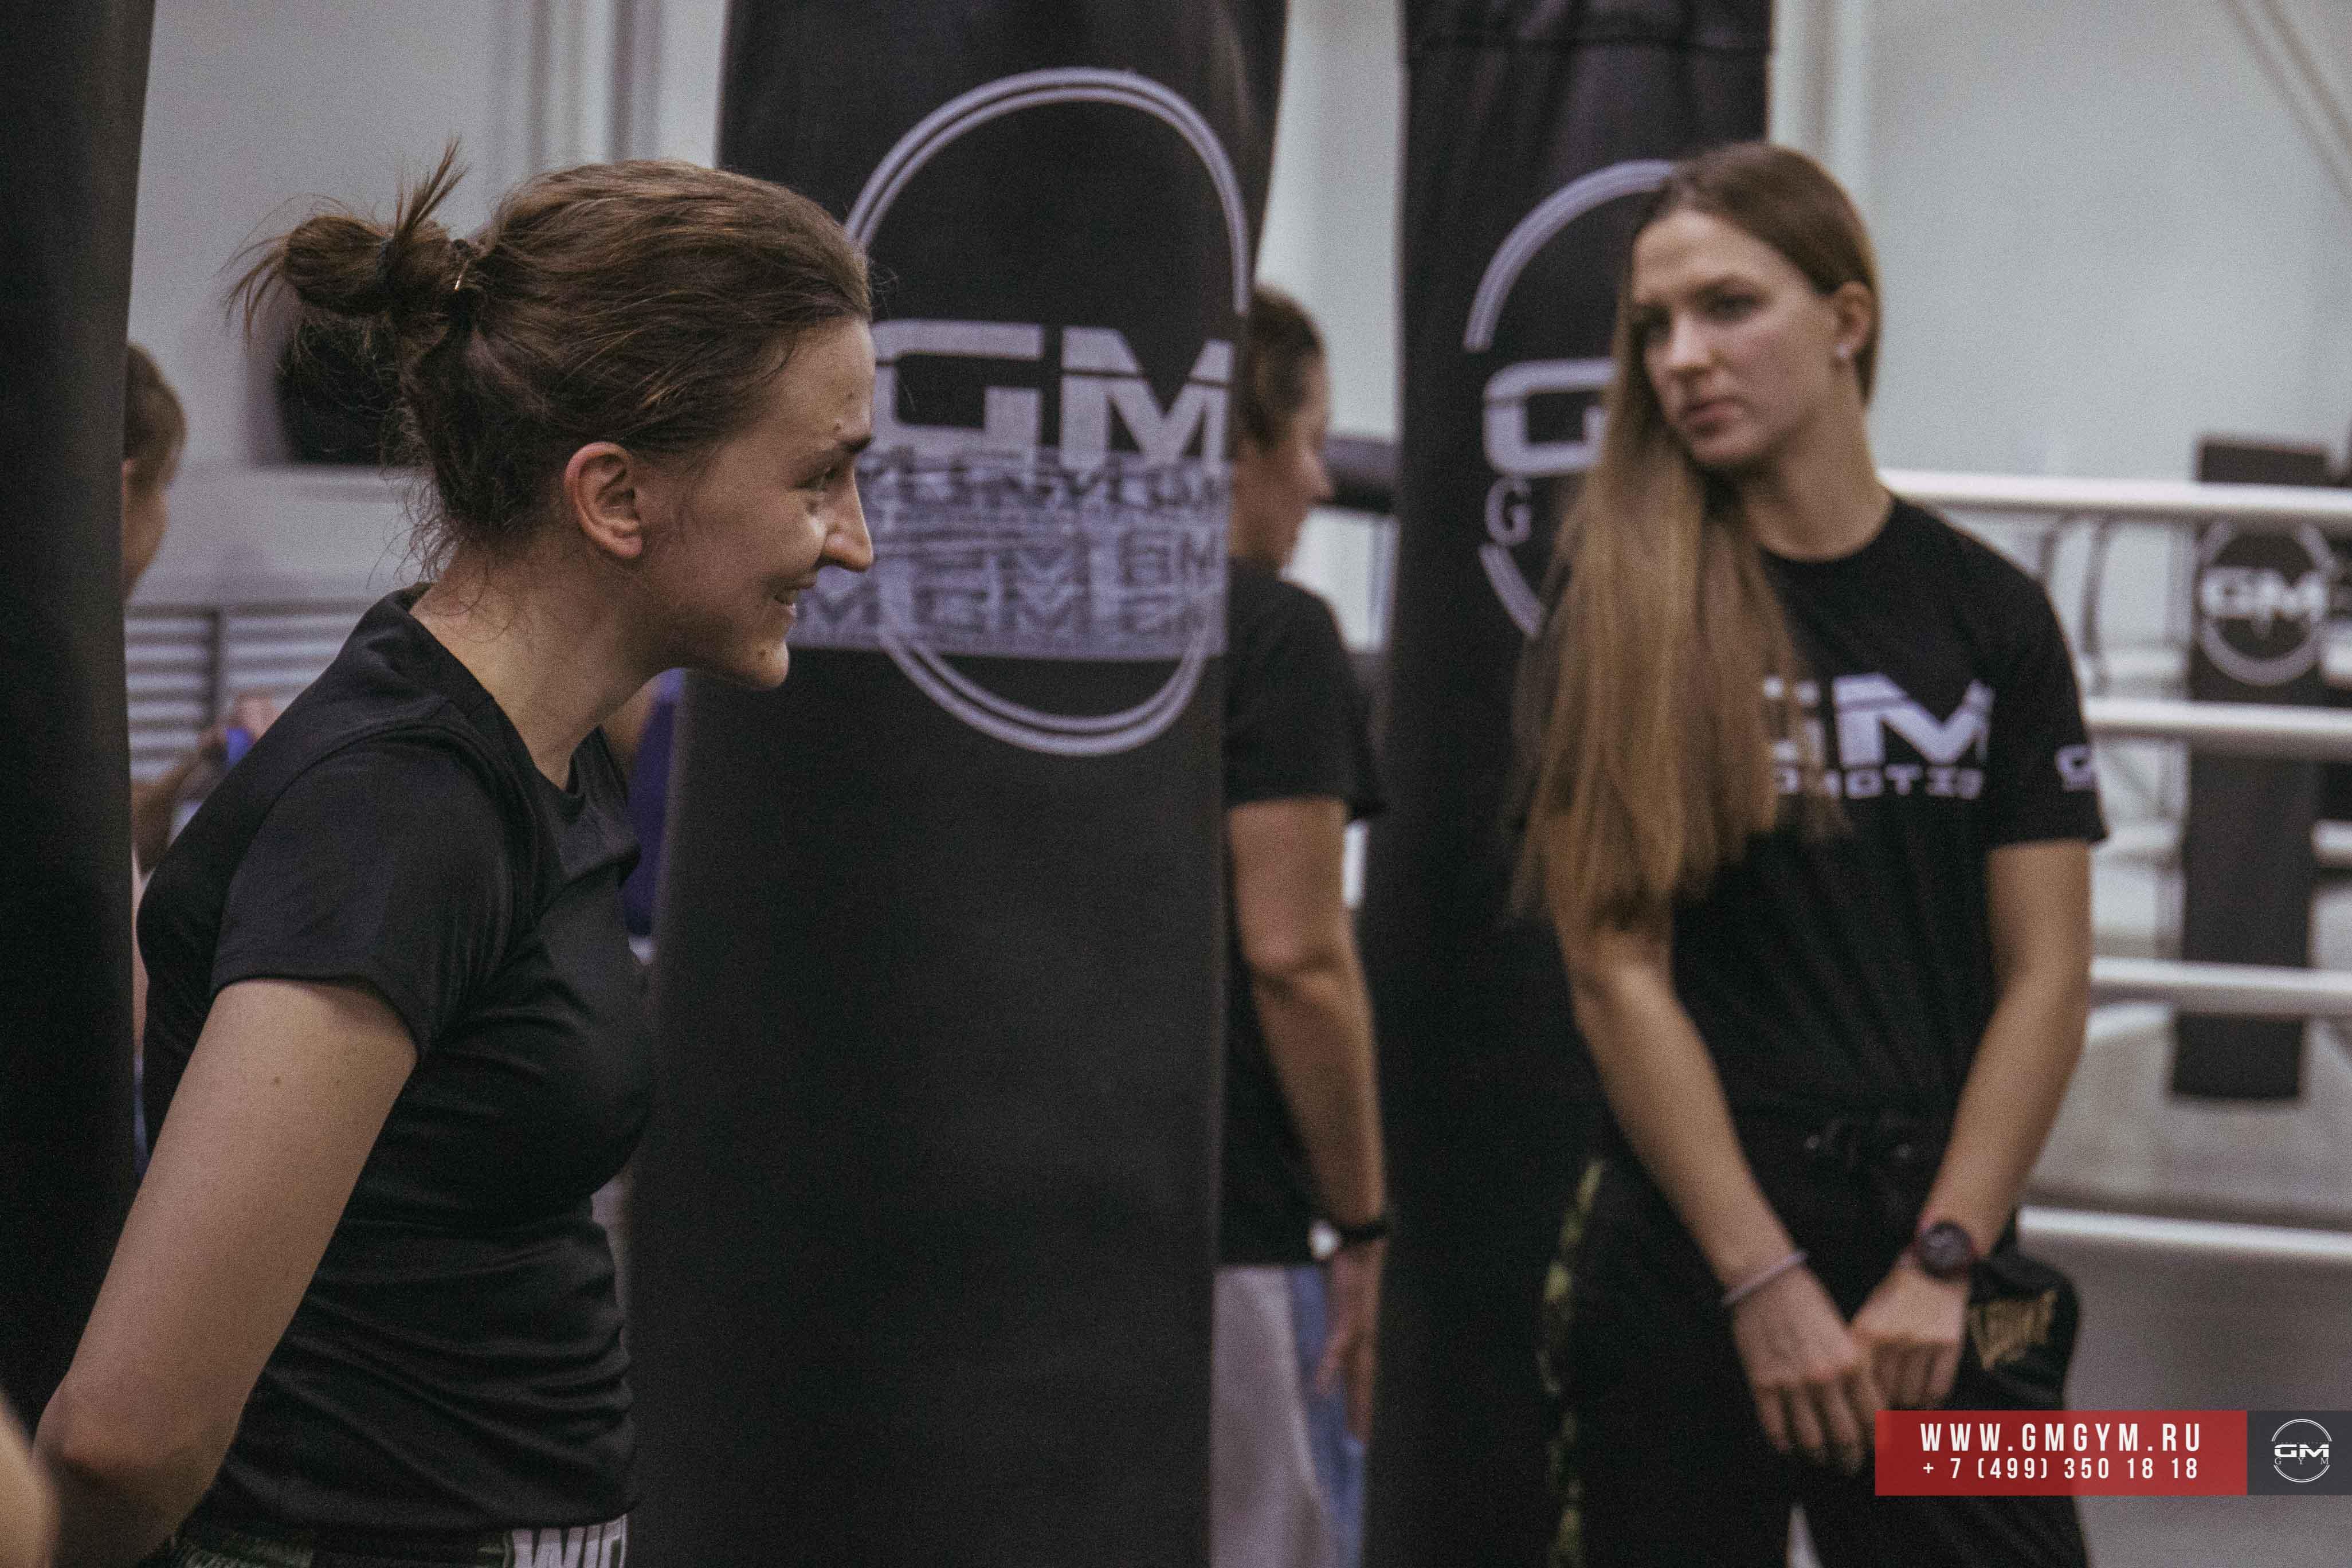 Тайский бокс (Винникова) 76